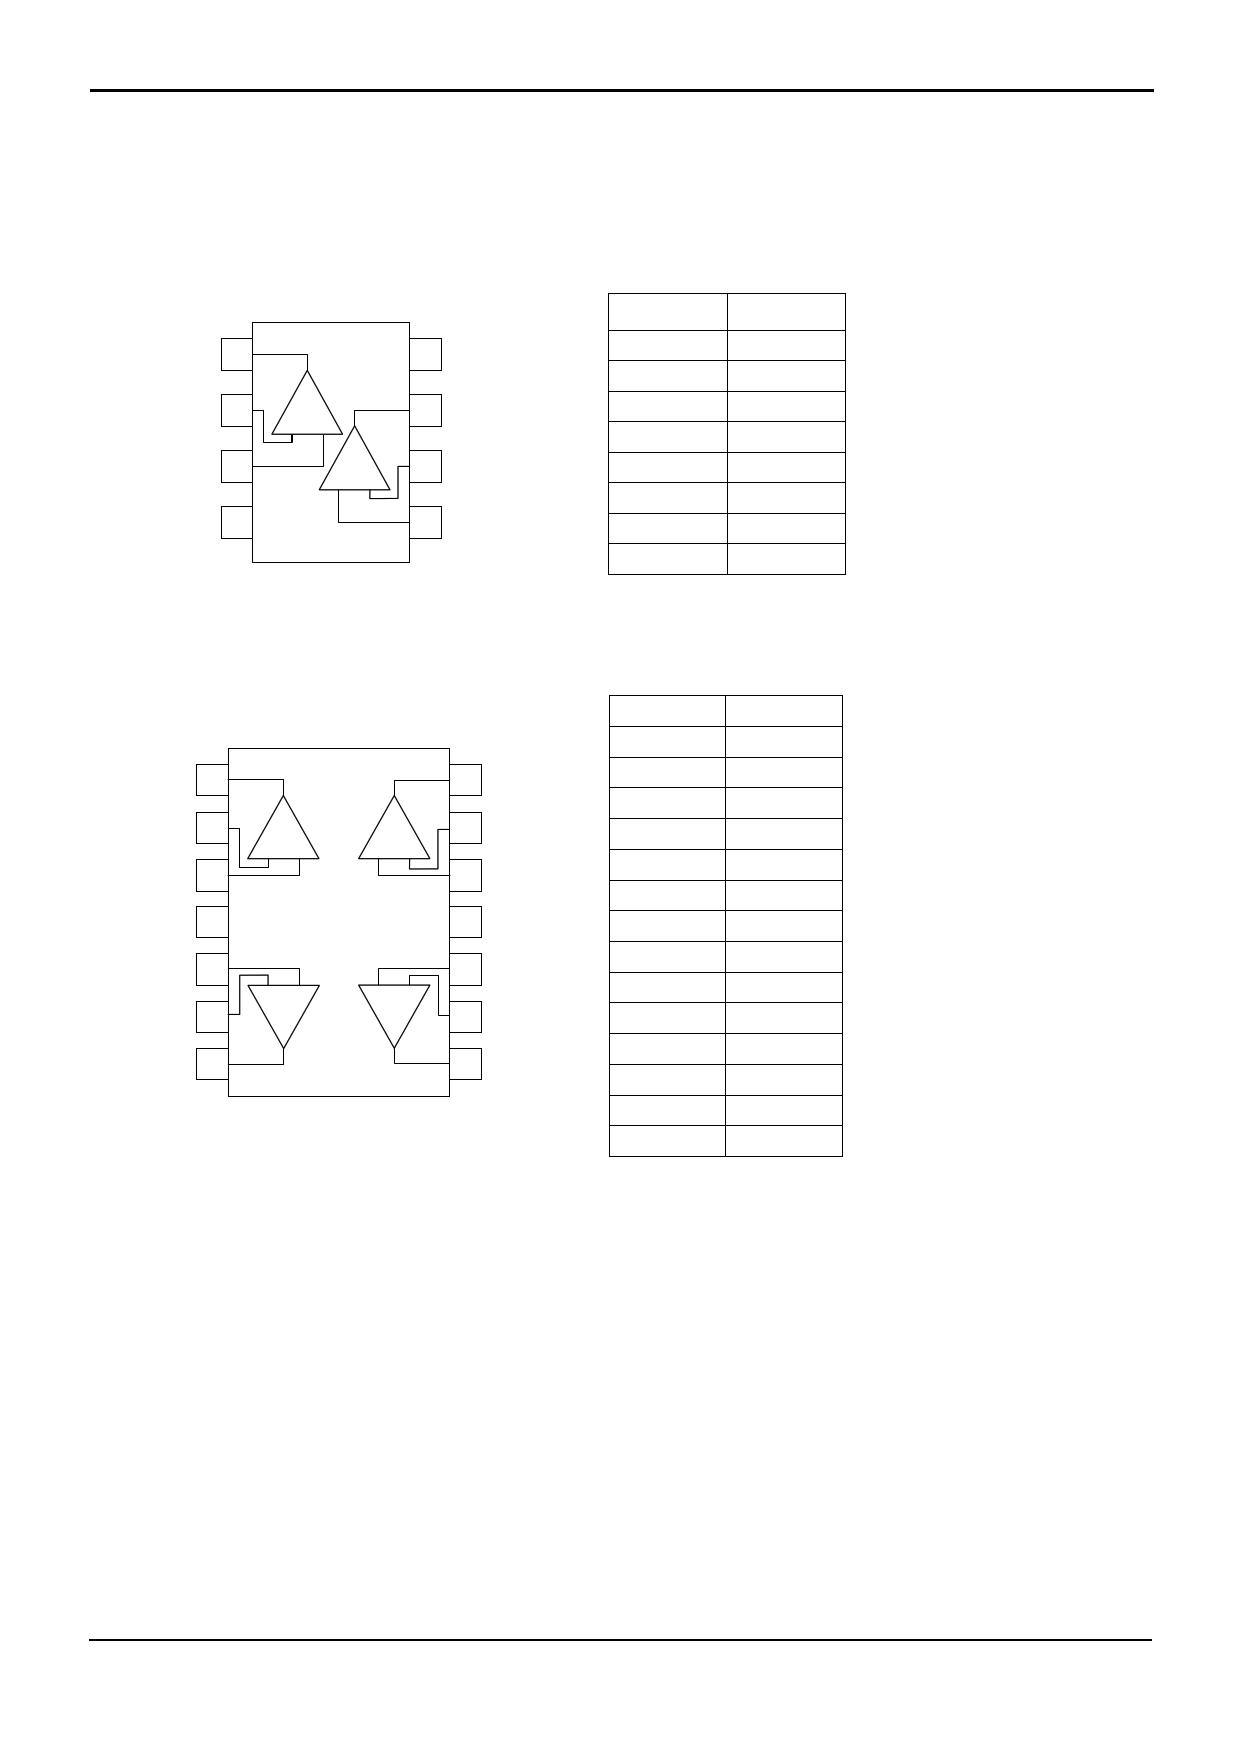 TLR344F pdf, equivalent, schematic